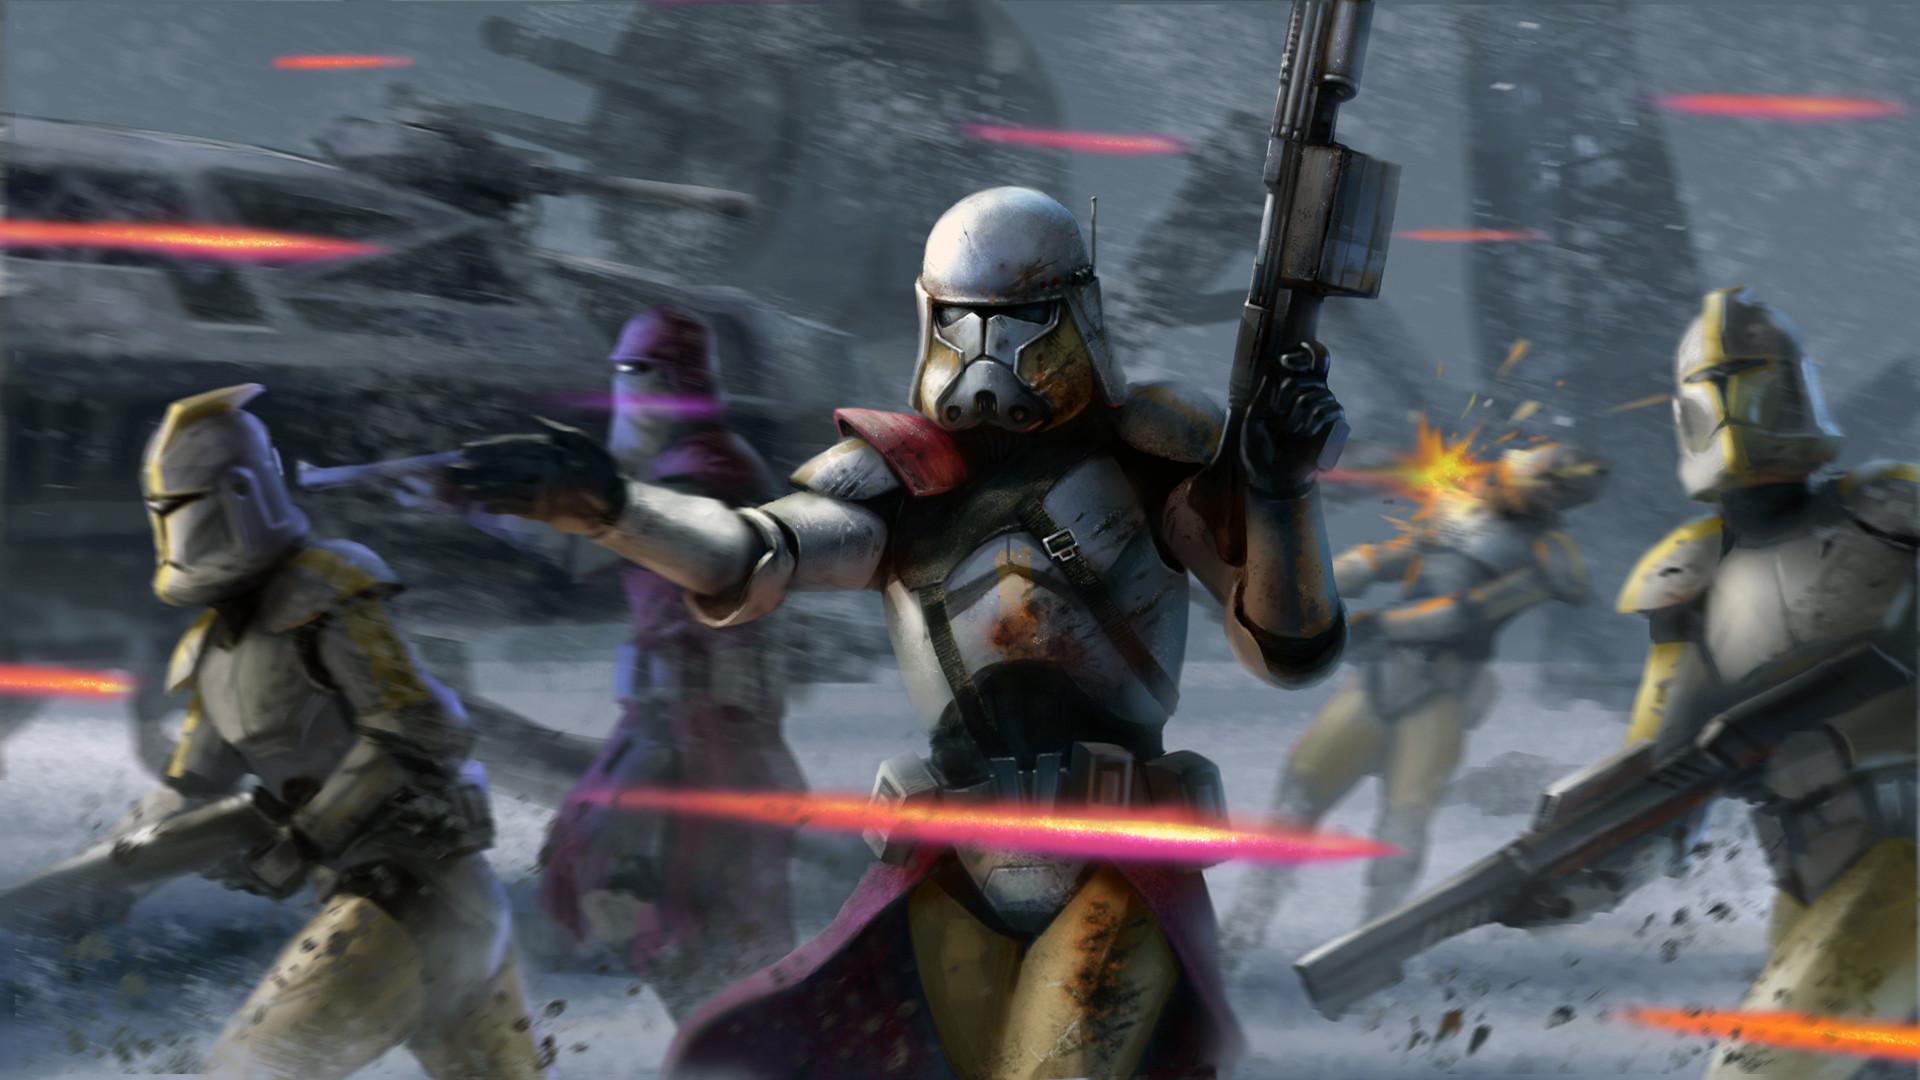 Clone Trooper Wallpaper 72 Images